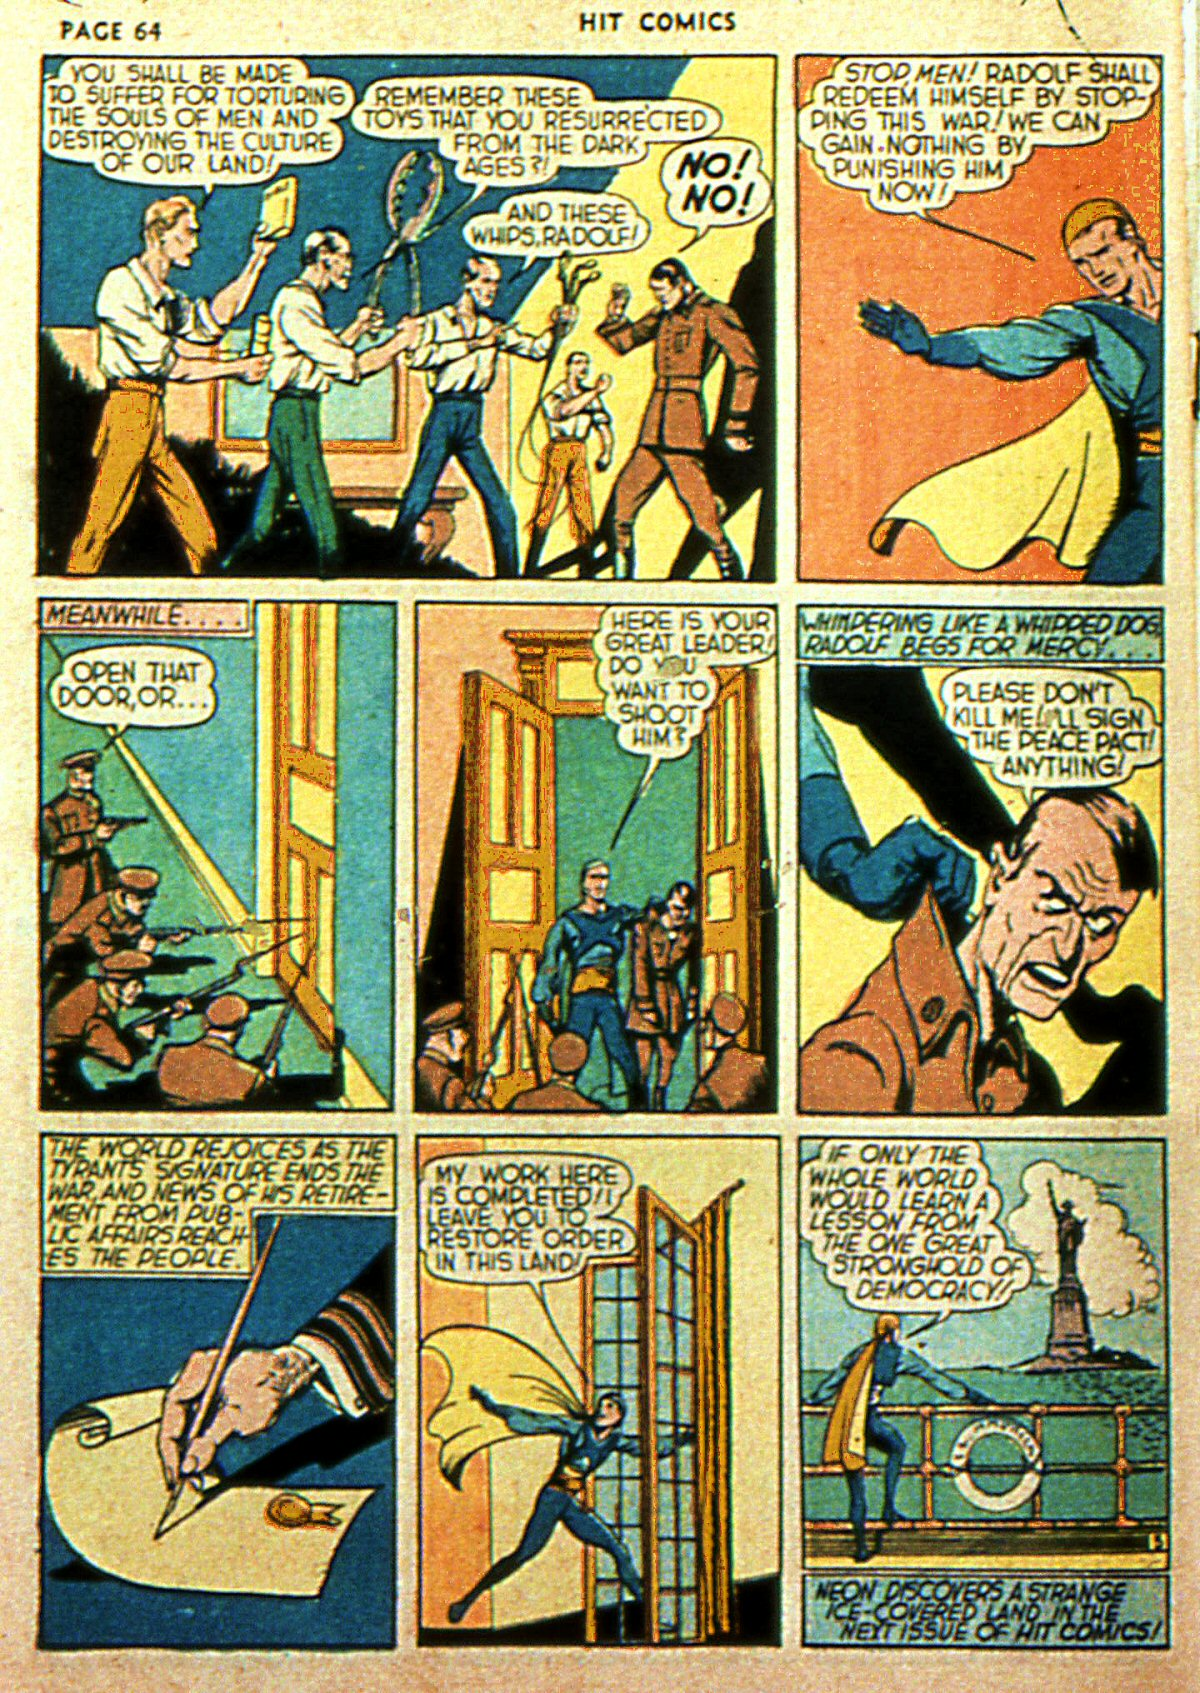 Read online Hit Comics comic -  Issue #2 - 66